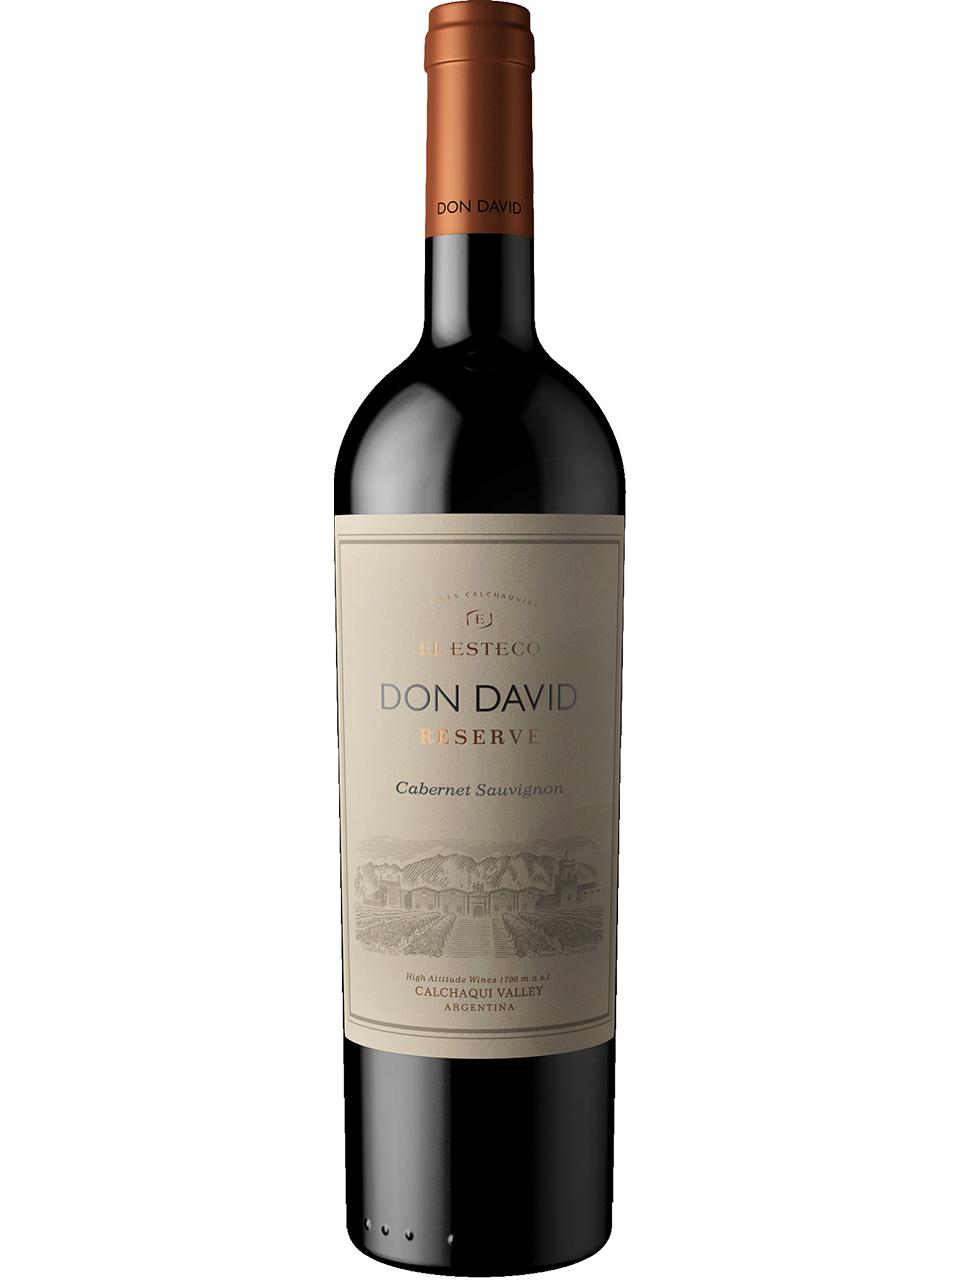 Don David Reserve Cabernet Sauvignon